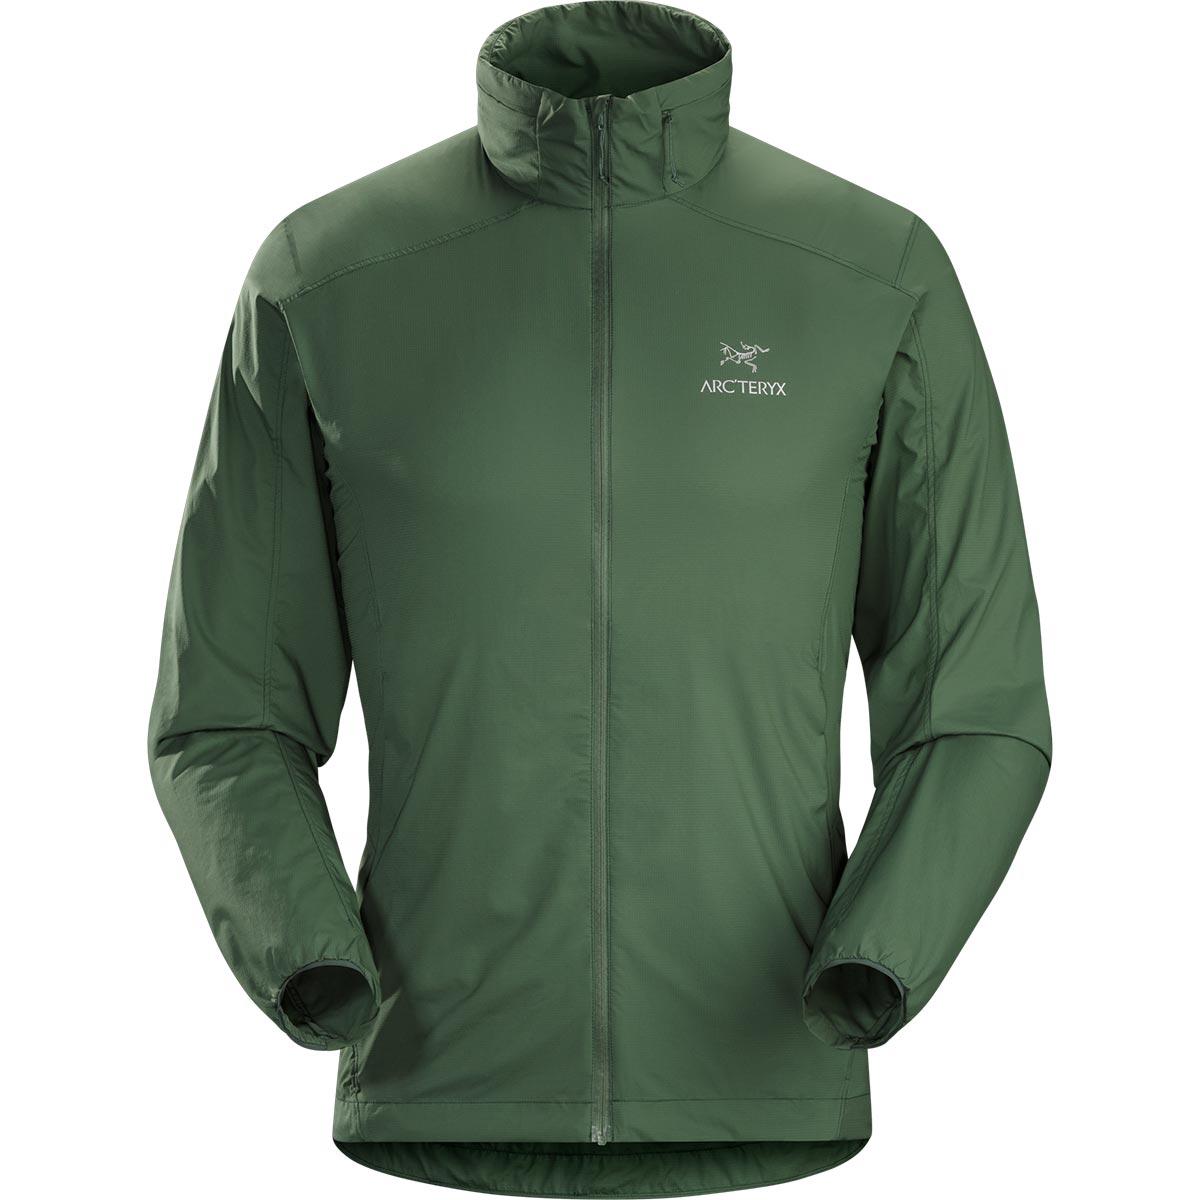 Arc Teryx Nodin Jacket Men S Discontinued Fall 2018